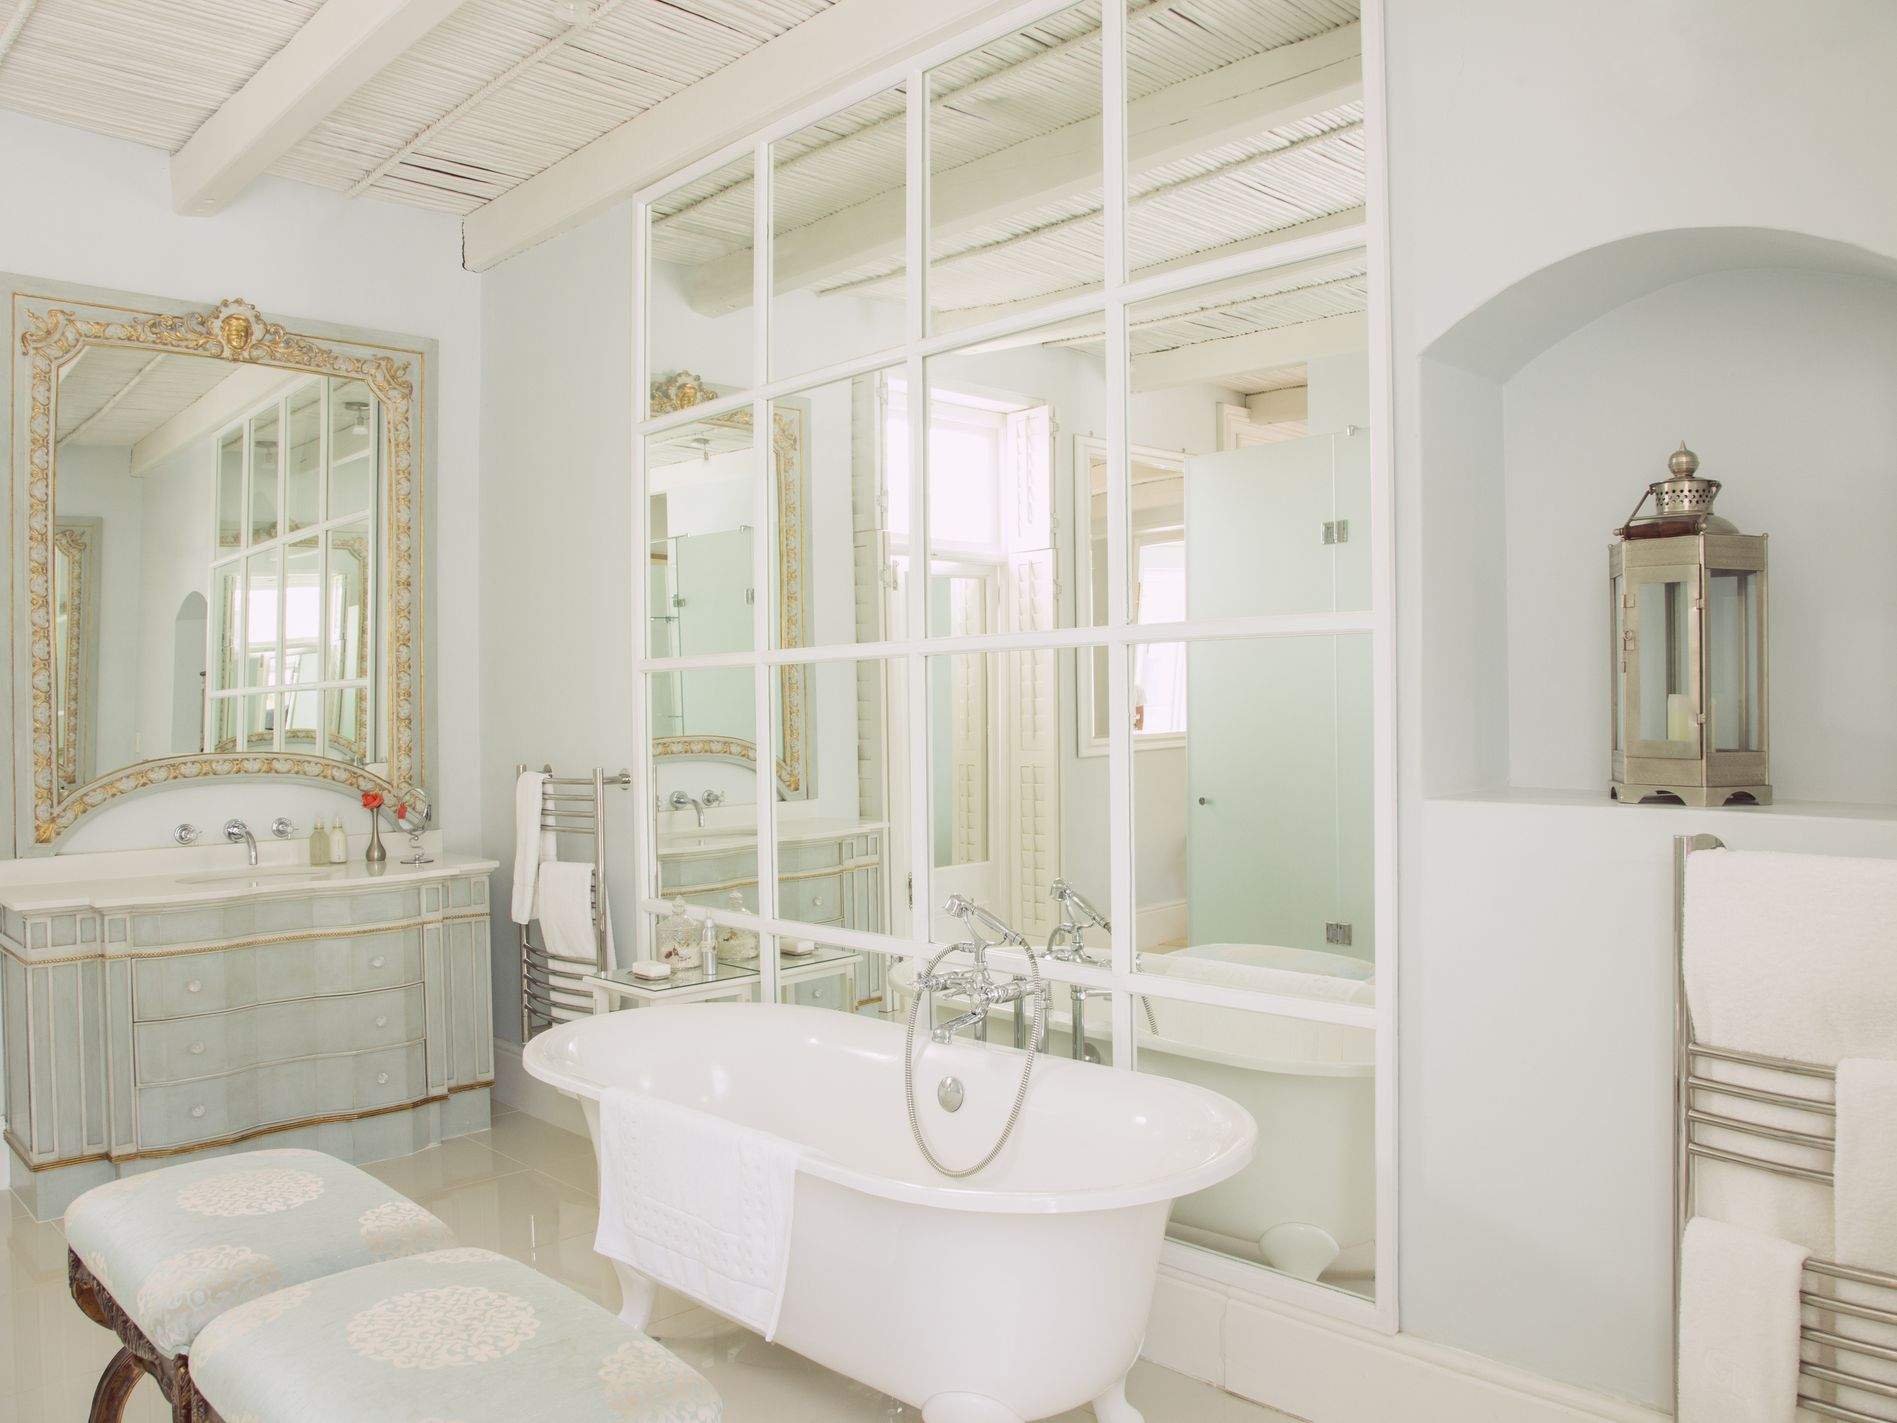 creative bathroom window dcor ideas discount bathroom.htm essential tips for an elegant bathroom design  an elegant bathroom design